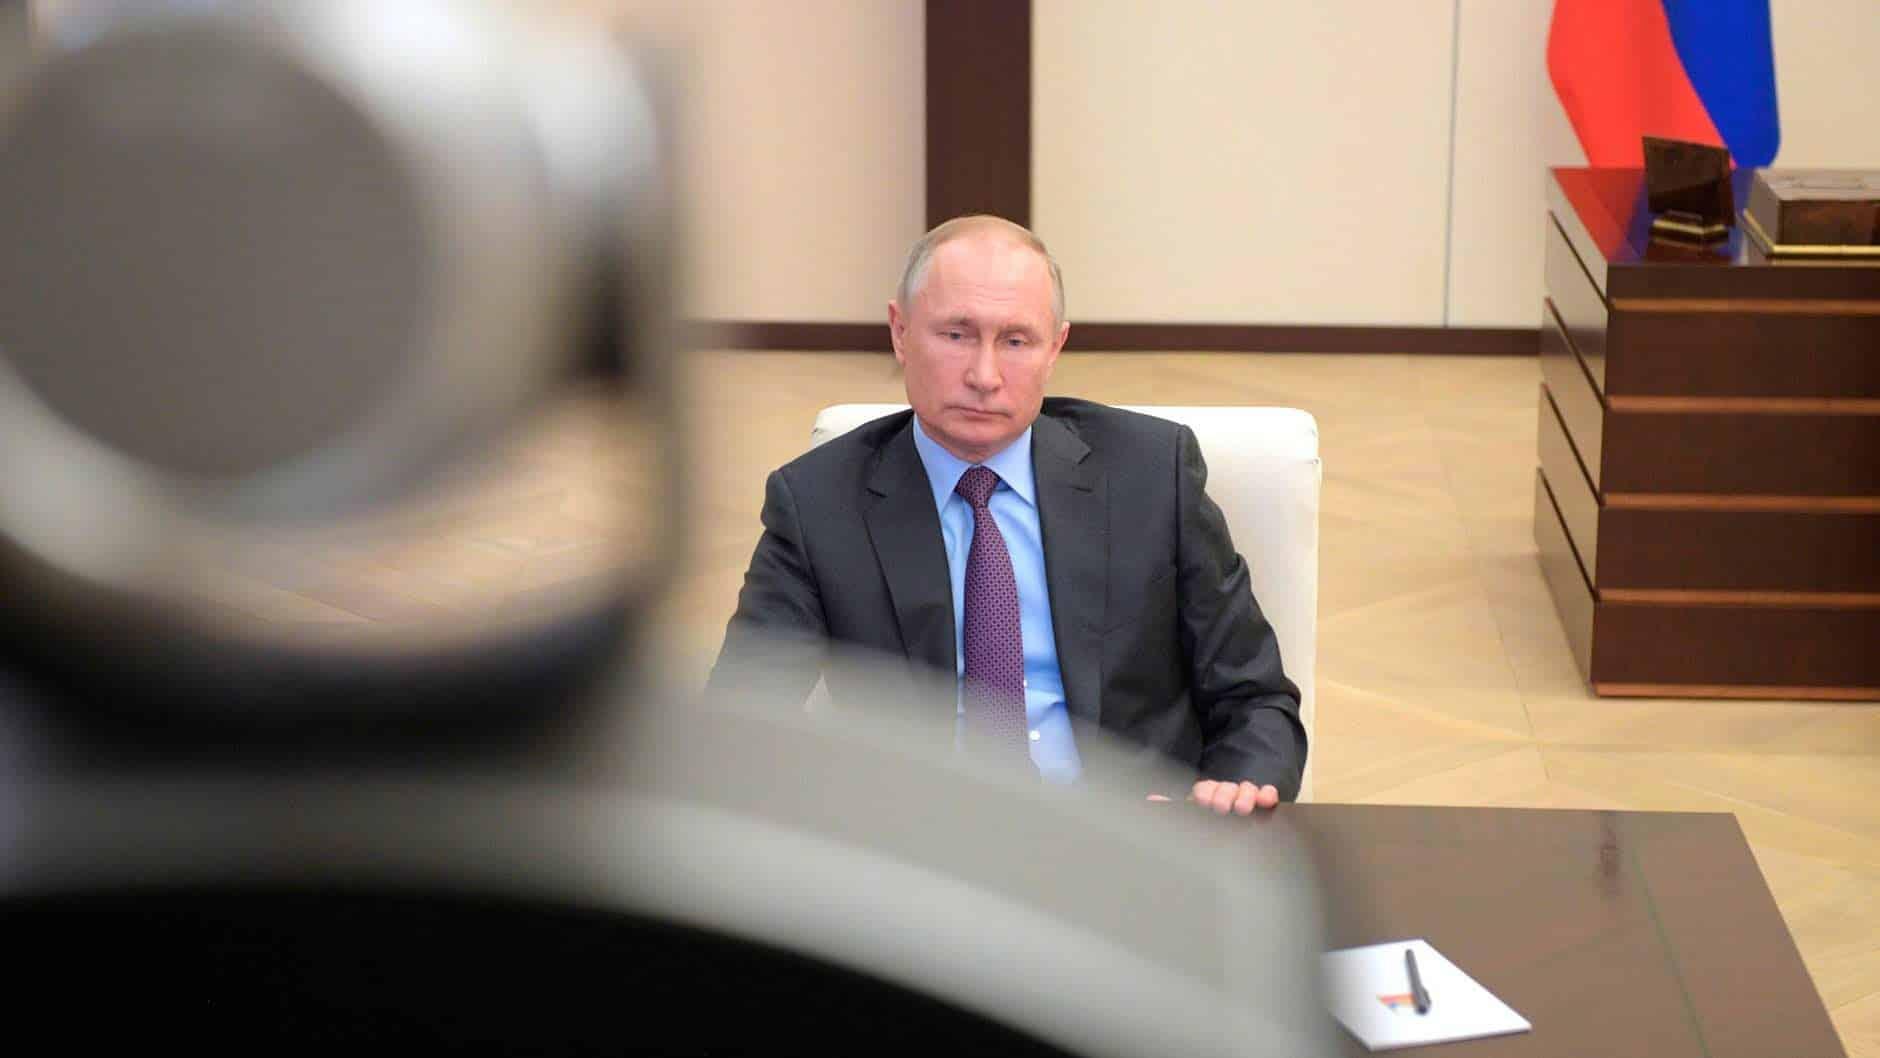 О стабилизации в России ситуации с коронавирусом заявил Владимир Путин